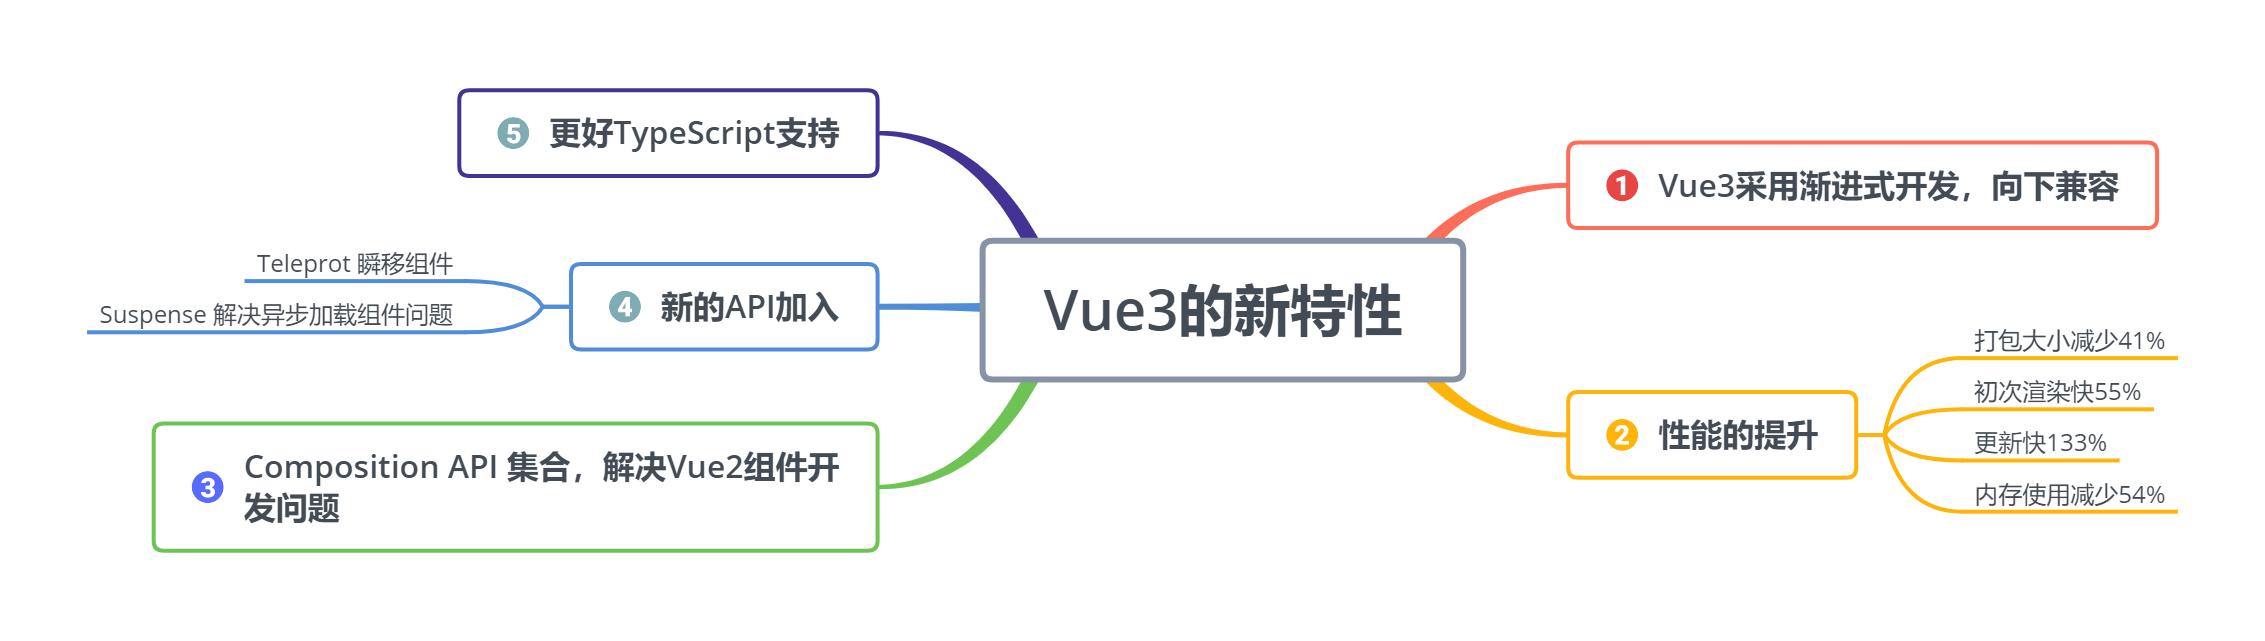 Vue3新特性